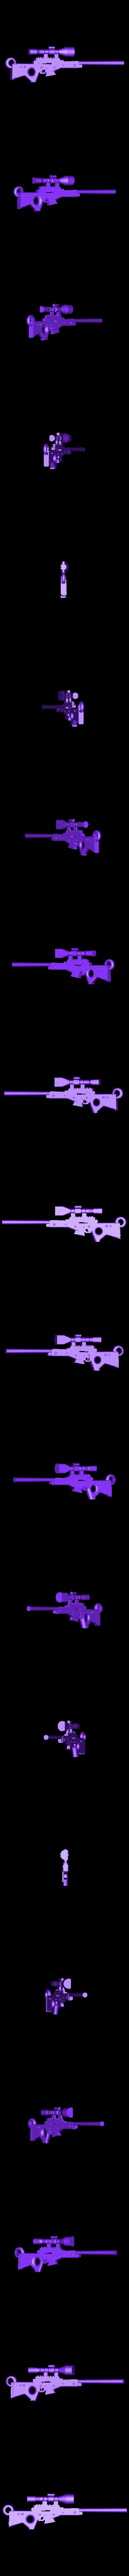 Sniper fortnite 3.stl Descargar archivo STL gratis Fortnite Sniper Key Chain • Plan para la impresión en 3D, davidbt96